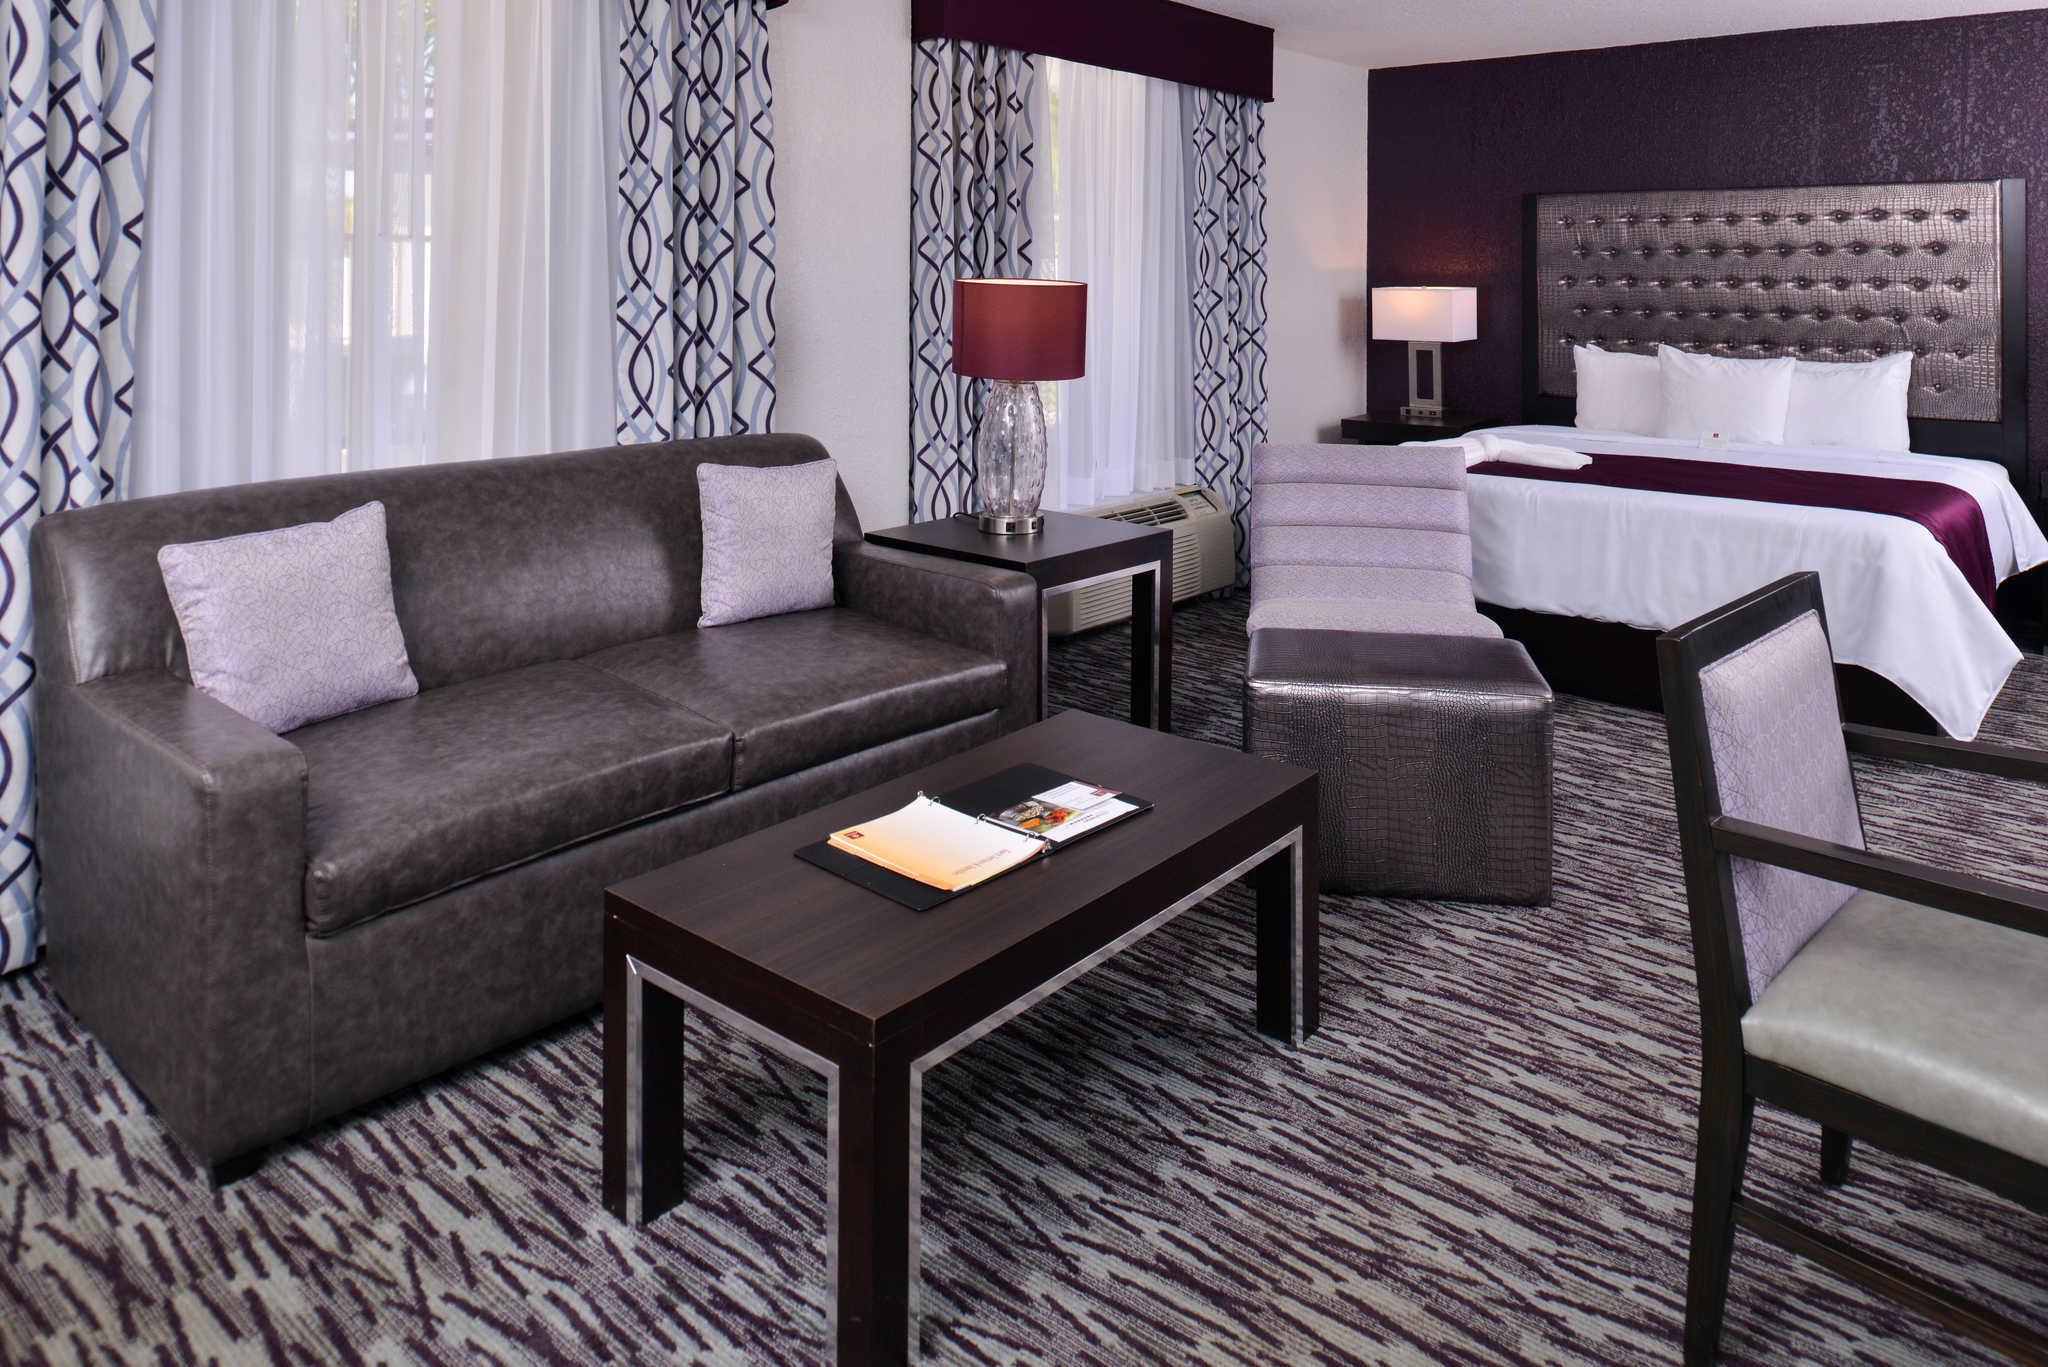 Clarion Inn & Suites Orlando near Theme Parks image 13